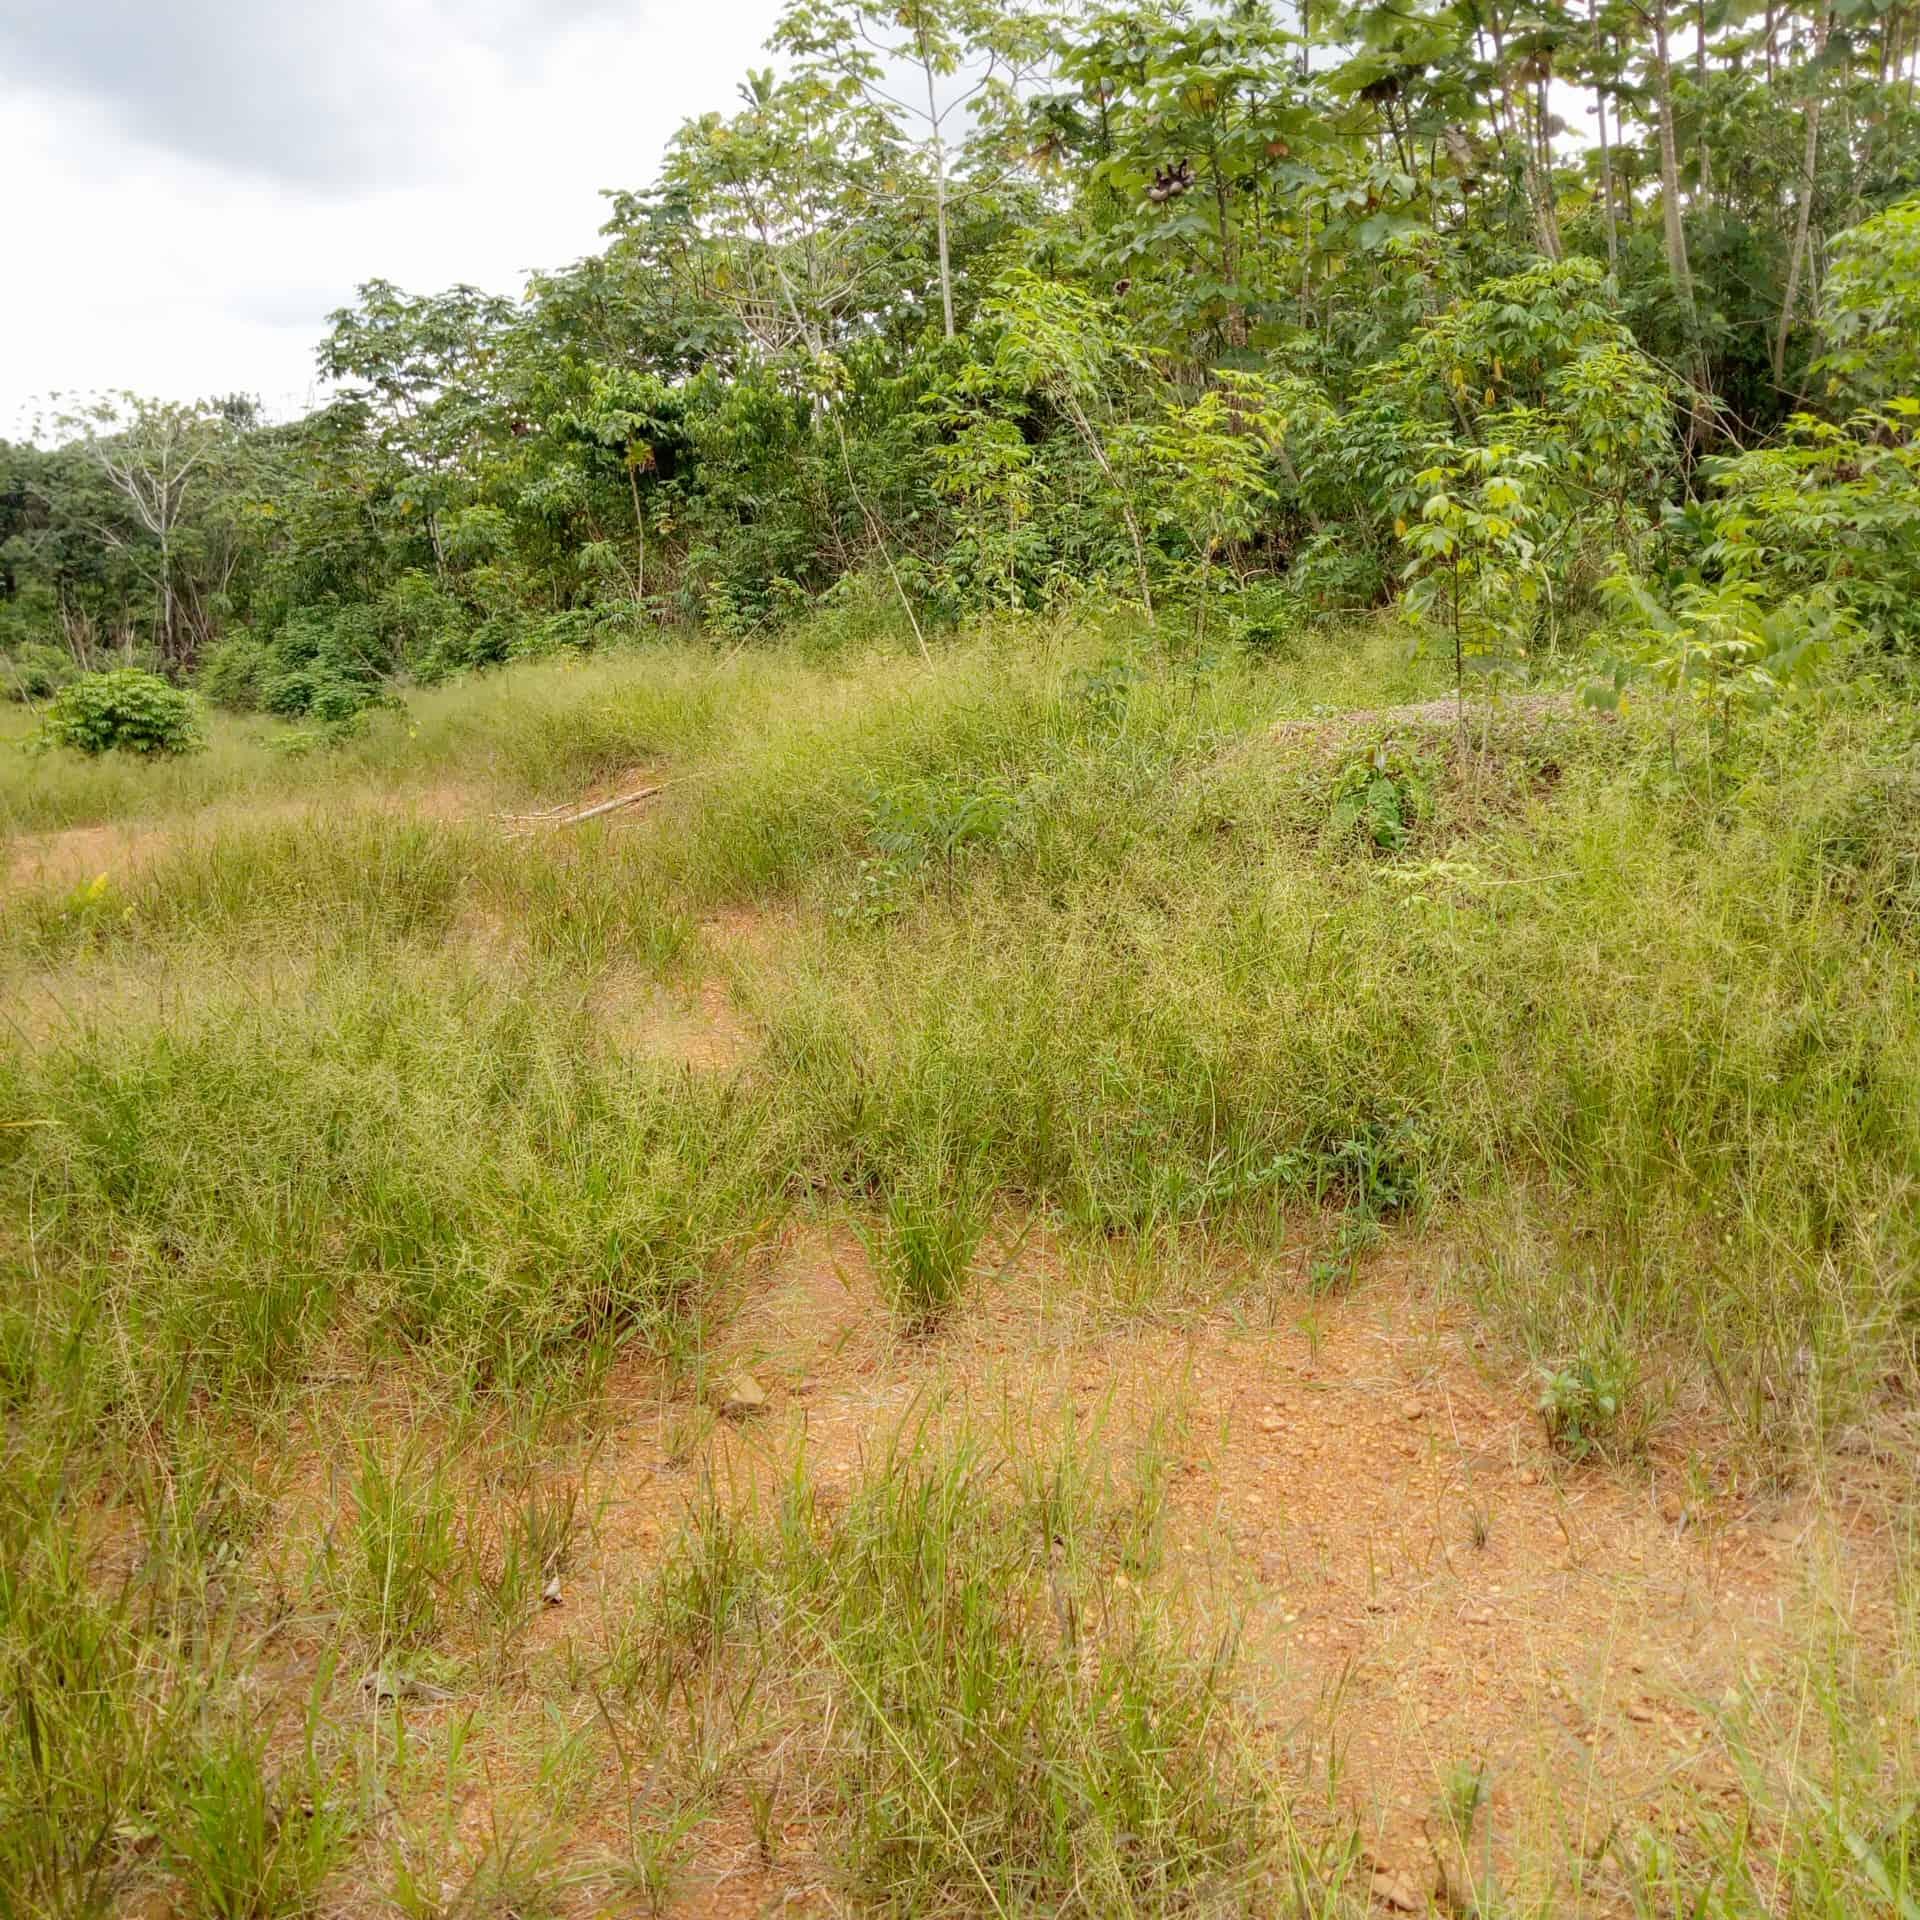 Land for sale at Douala, Bassa, Dibamba entrée kendeck - 10000 m2 - 6 000 000 FCFA